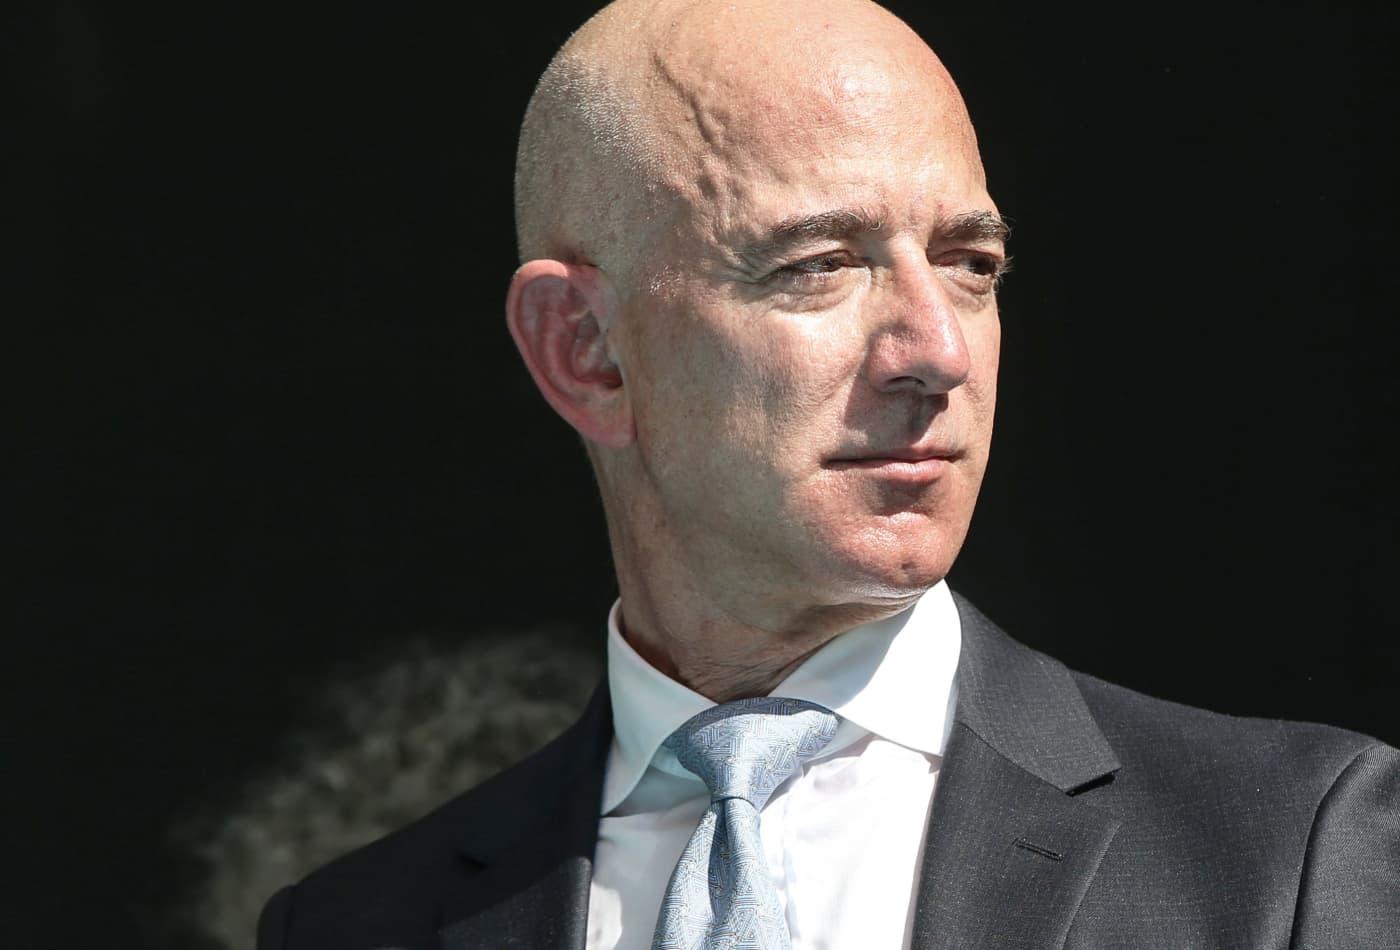 NYC Mayor Bill de Blasio orders investigation of Amazon's firing of strike organizer